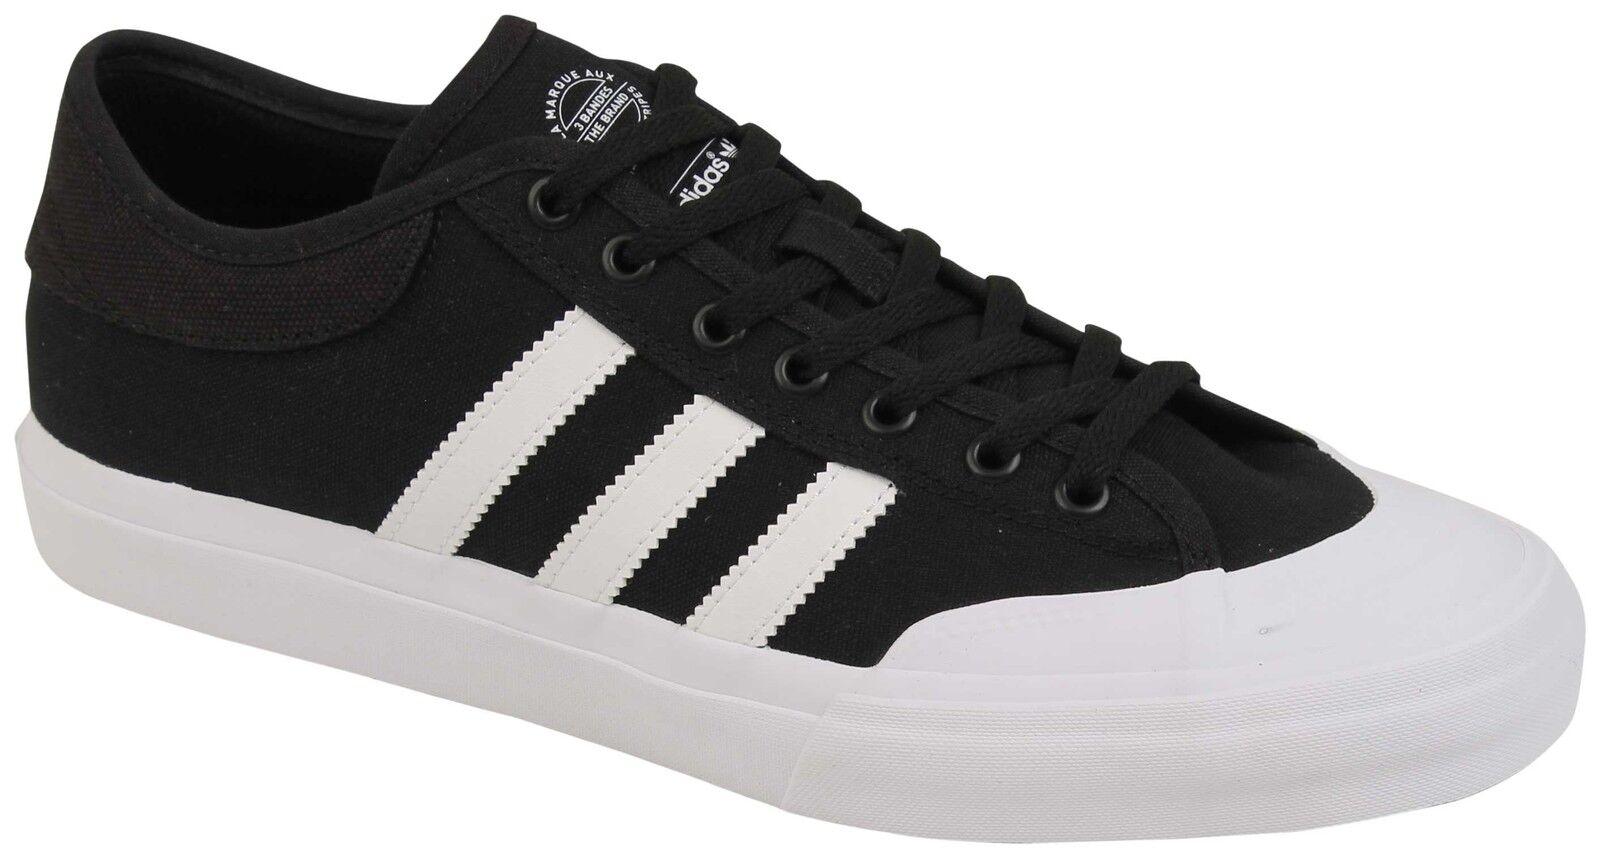 Adidas Matchcourt shoes - Core Black   White - New